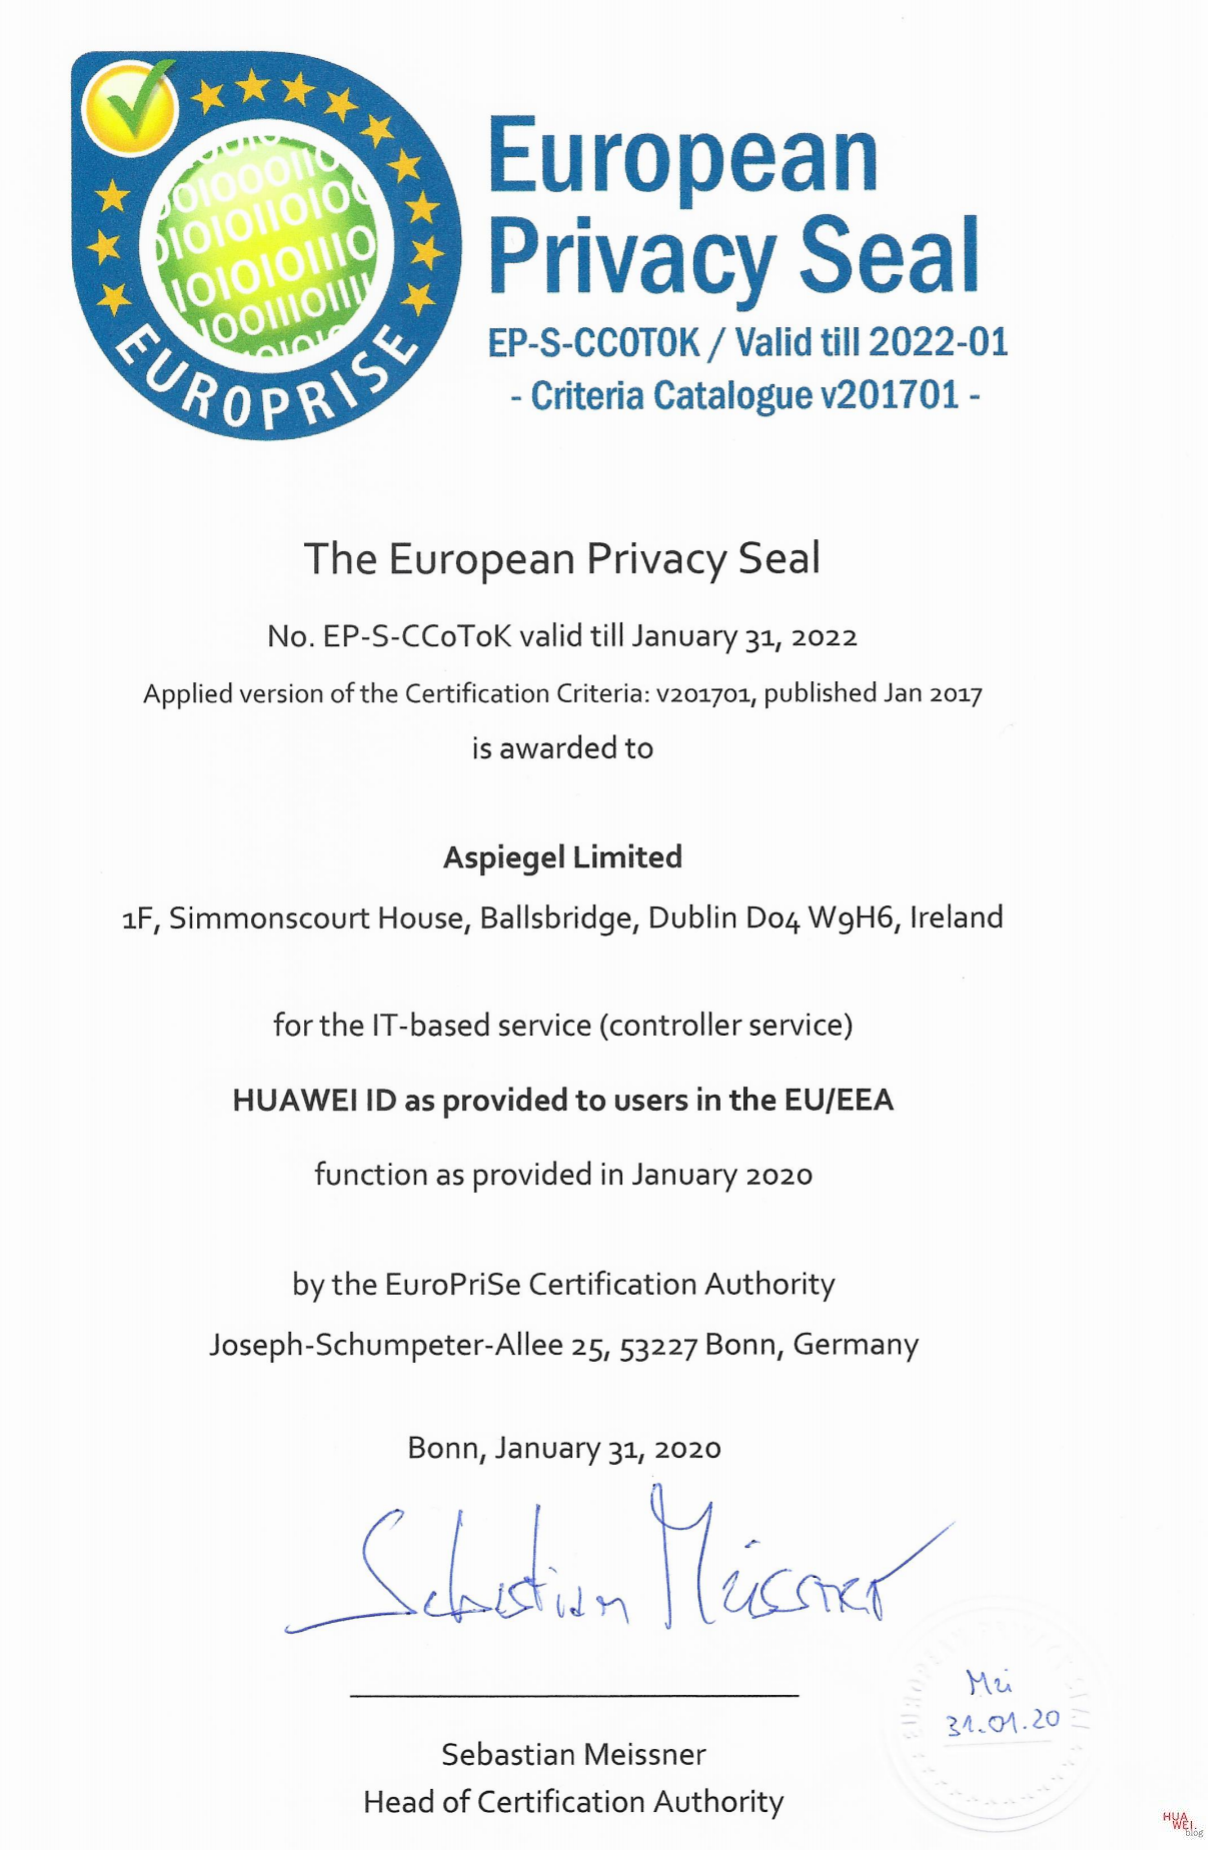 European Privacy Seal